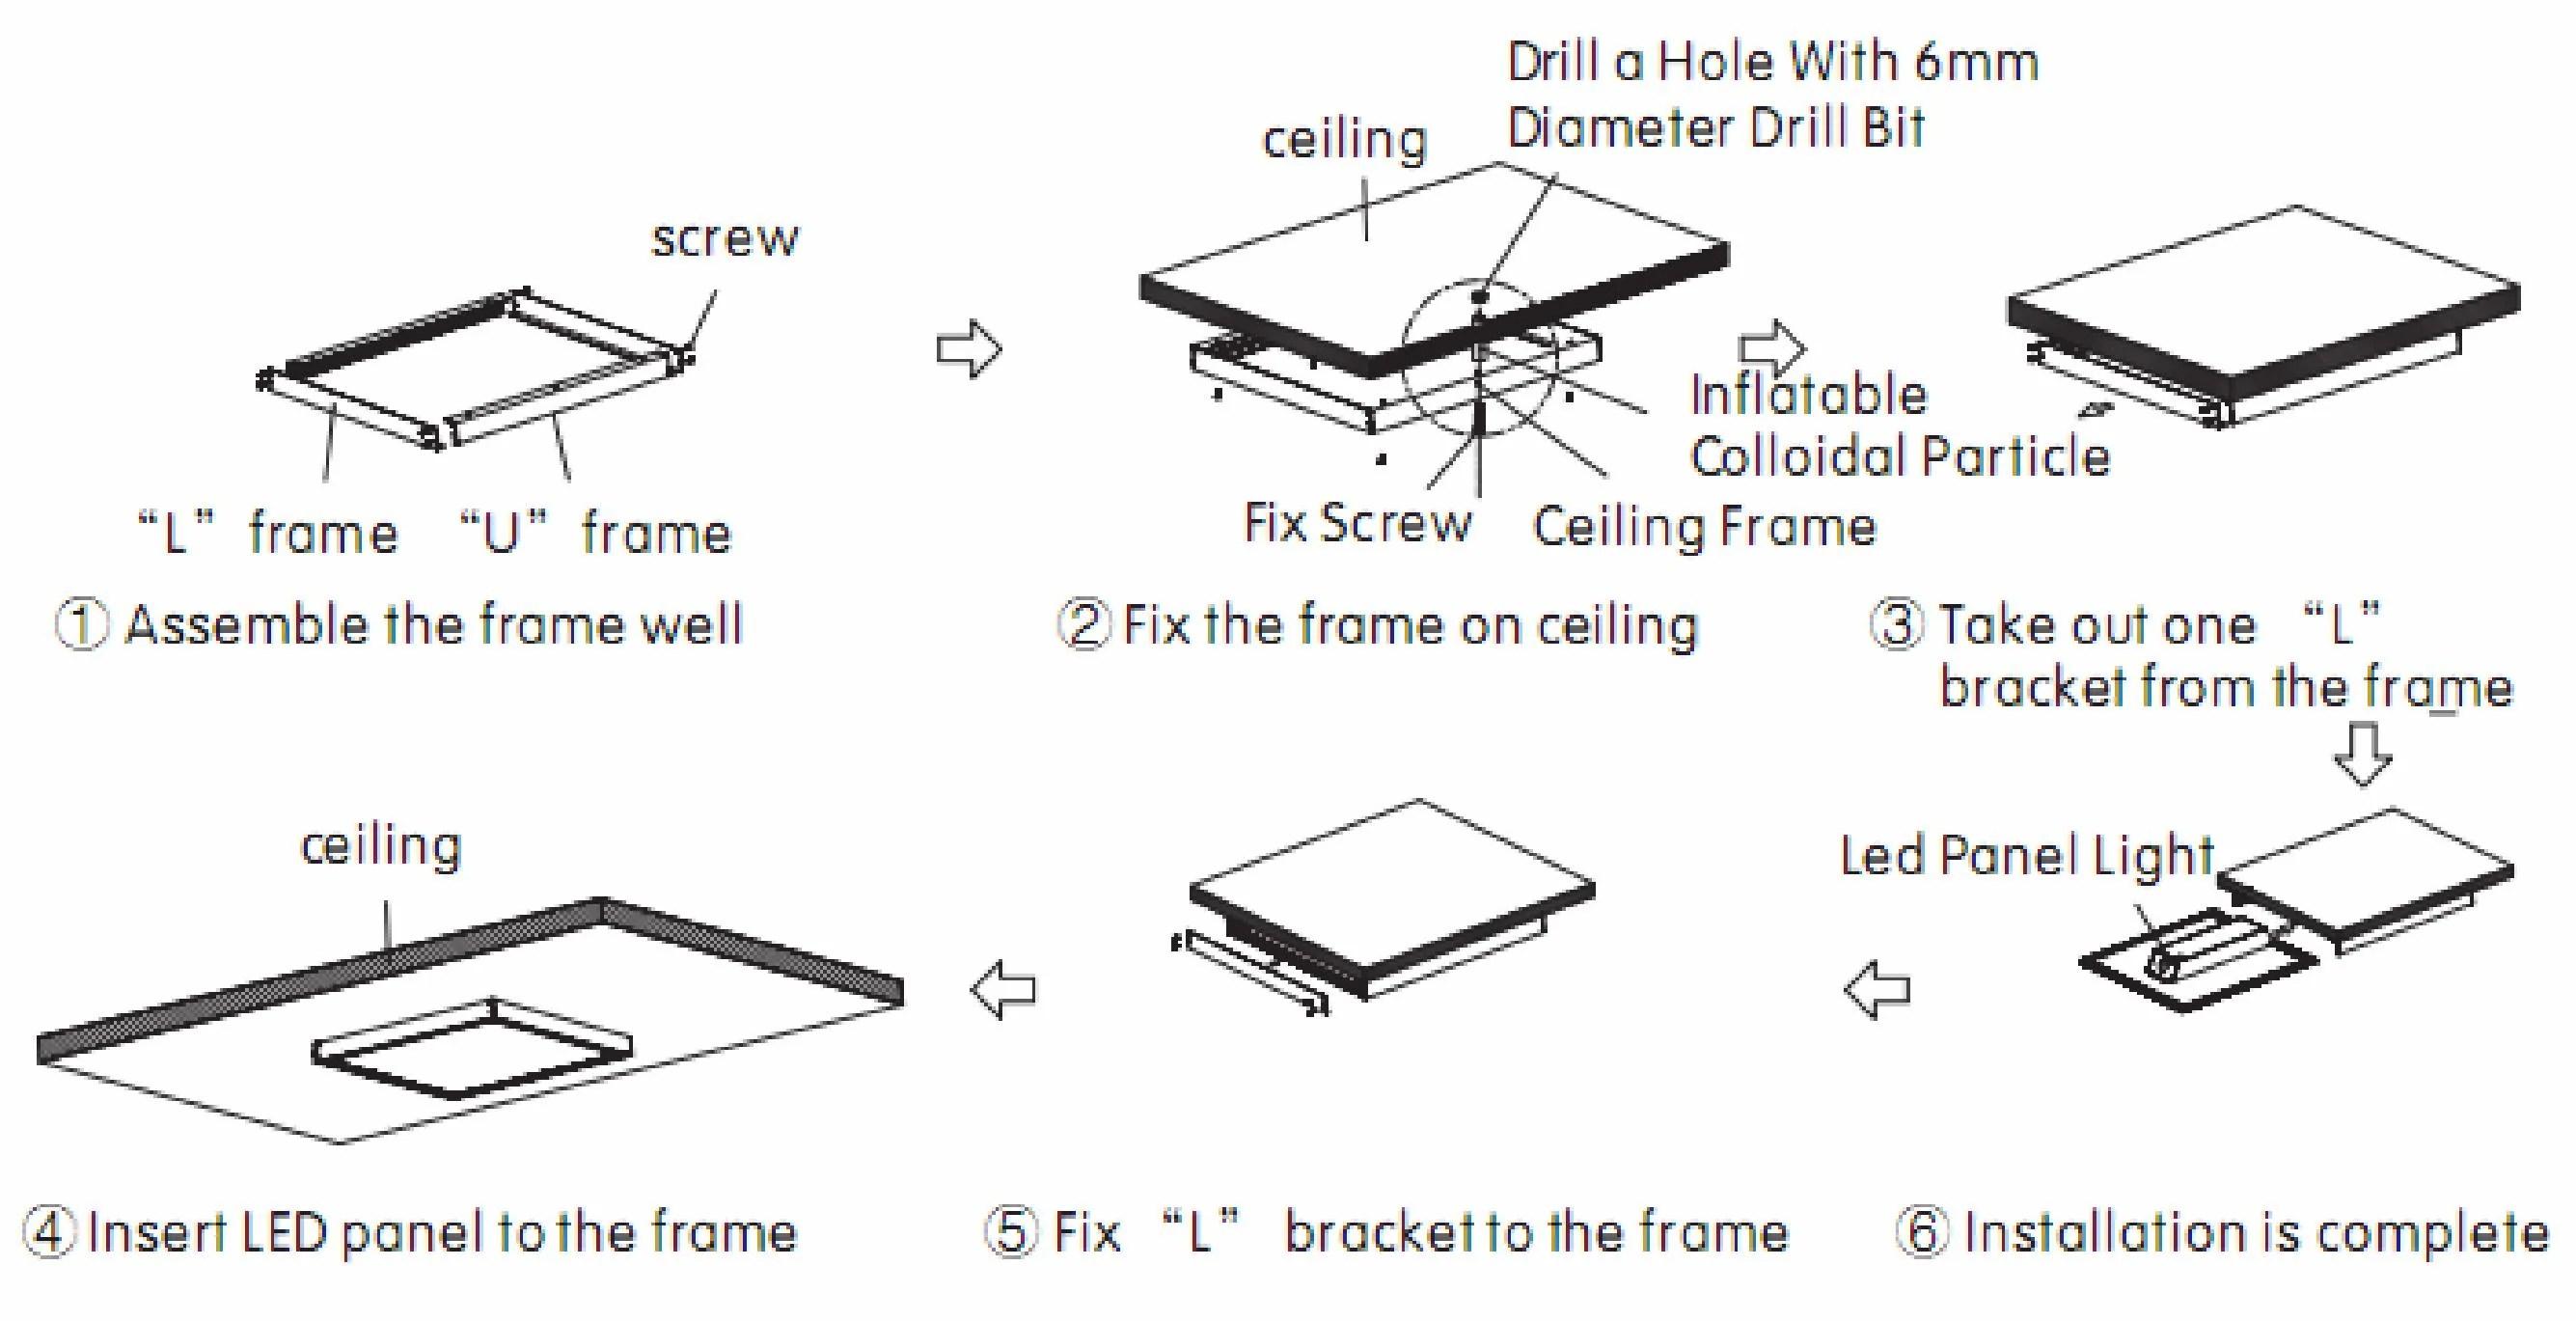 medium resolution of led panel light wiring diagram wiring diagram led panel light diagram led panel diagram wiring diagramled